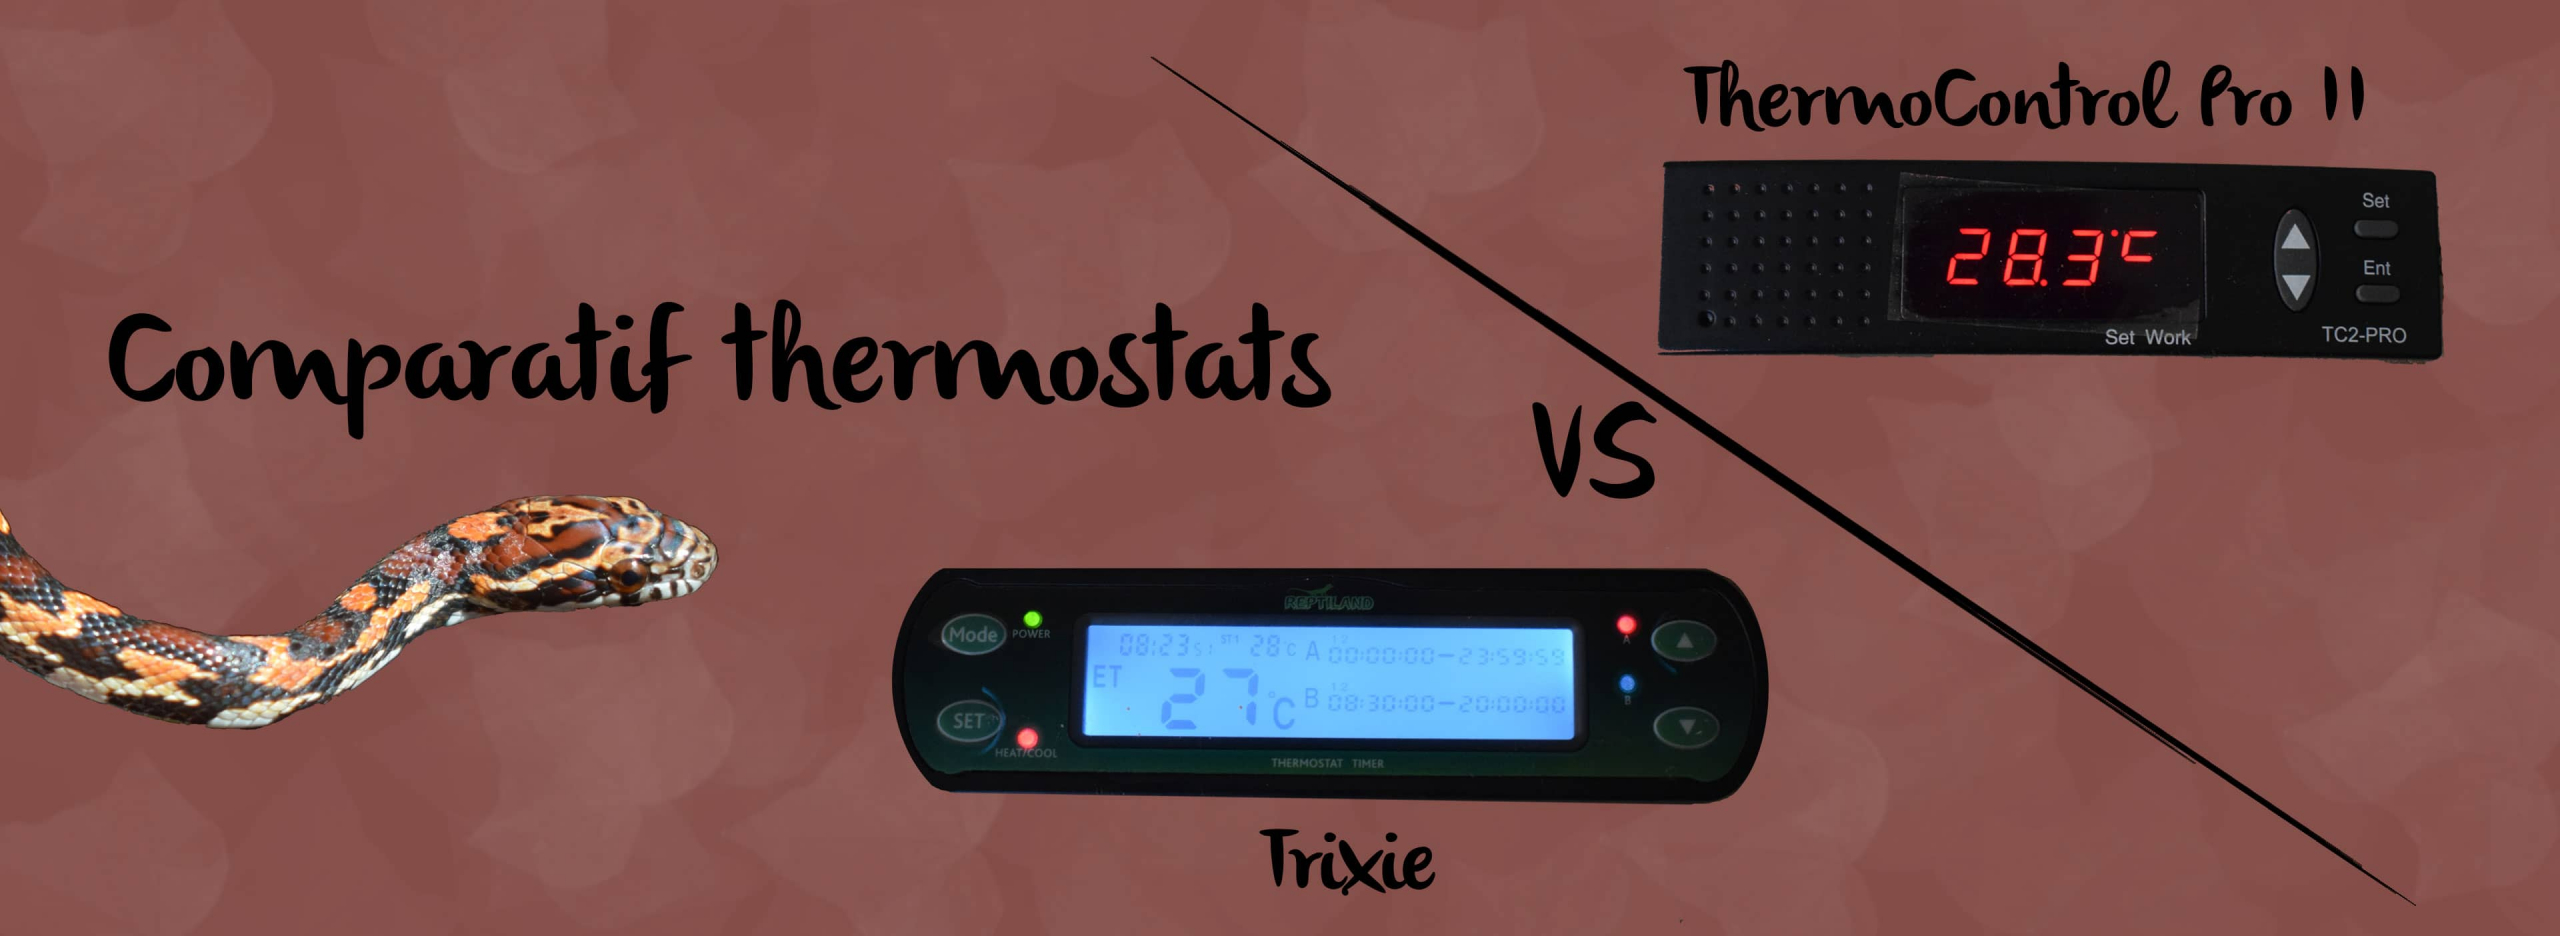 comparatif-thermostats-reptiles